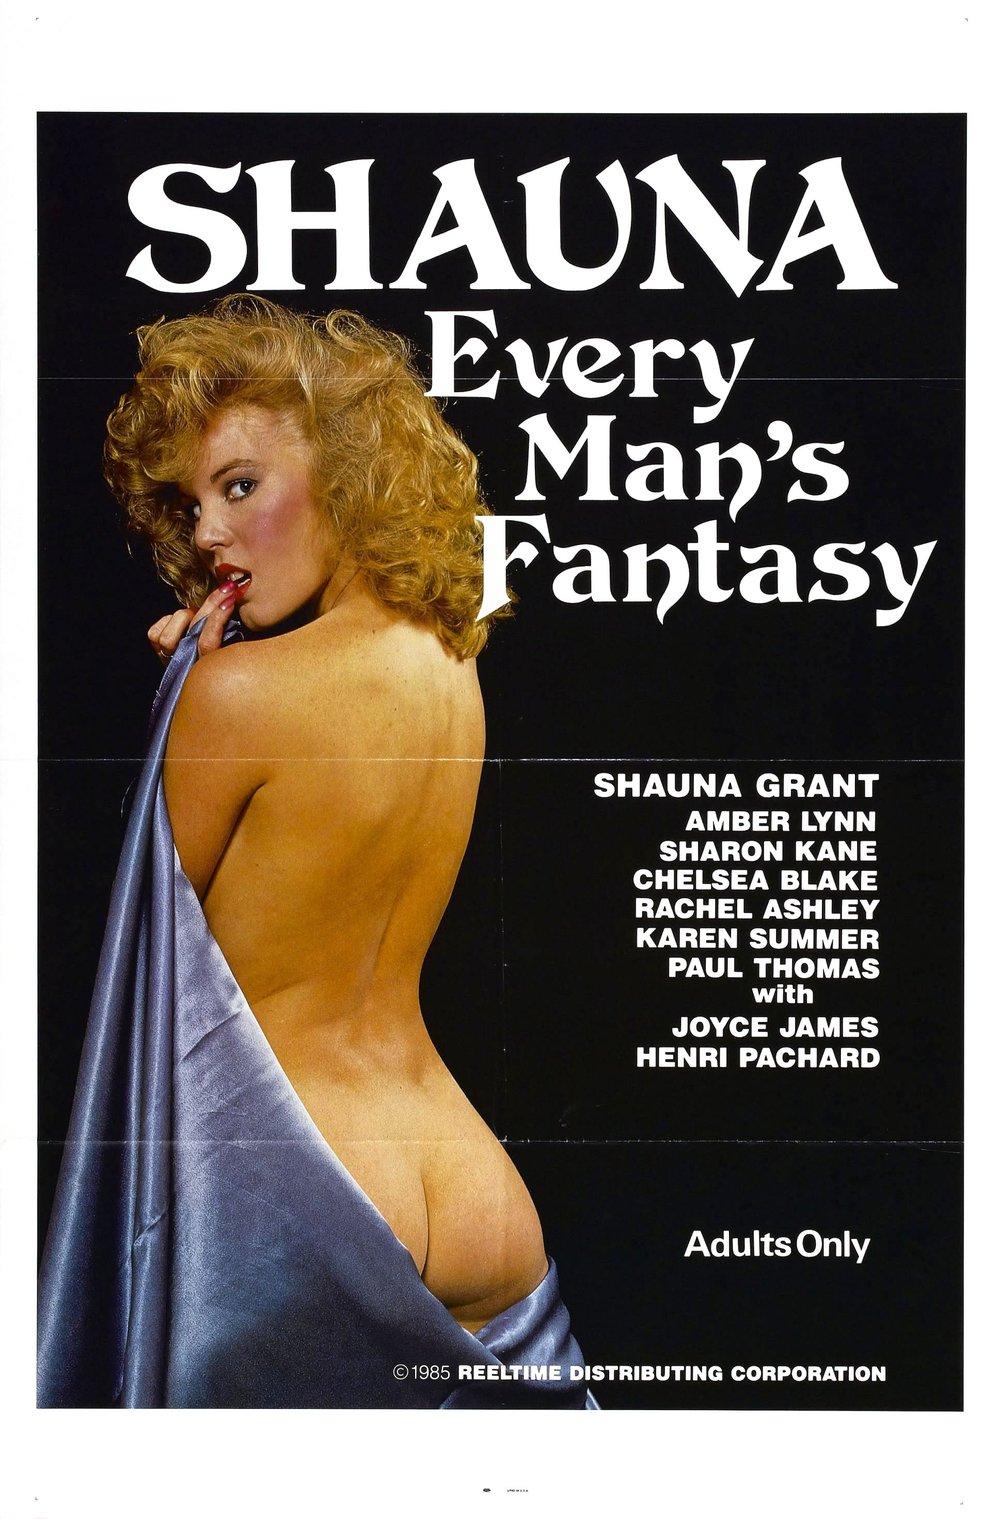 shauna_every_mans_fantasy_poster_01.jpg